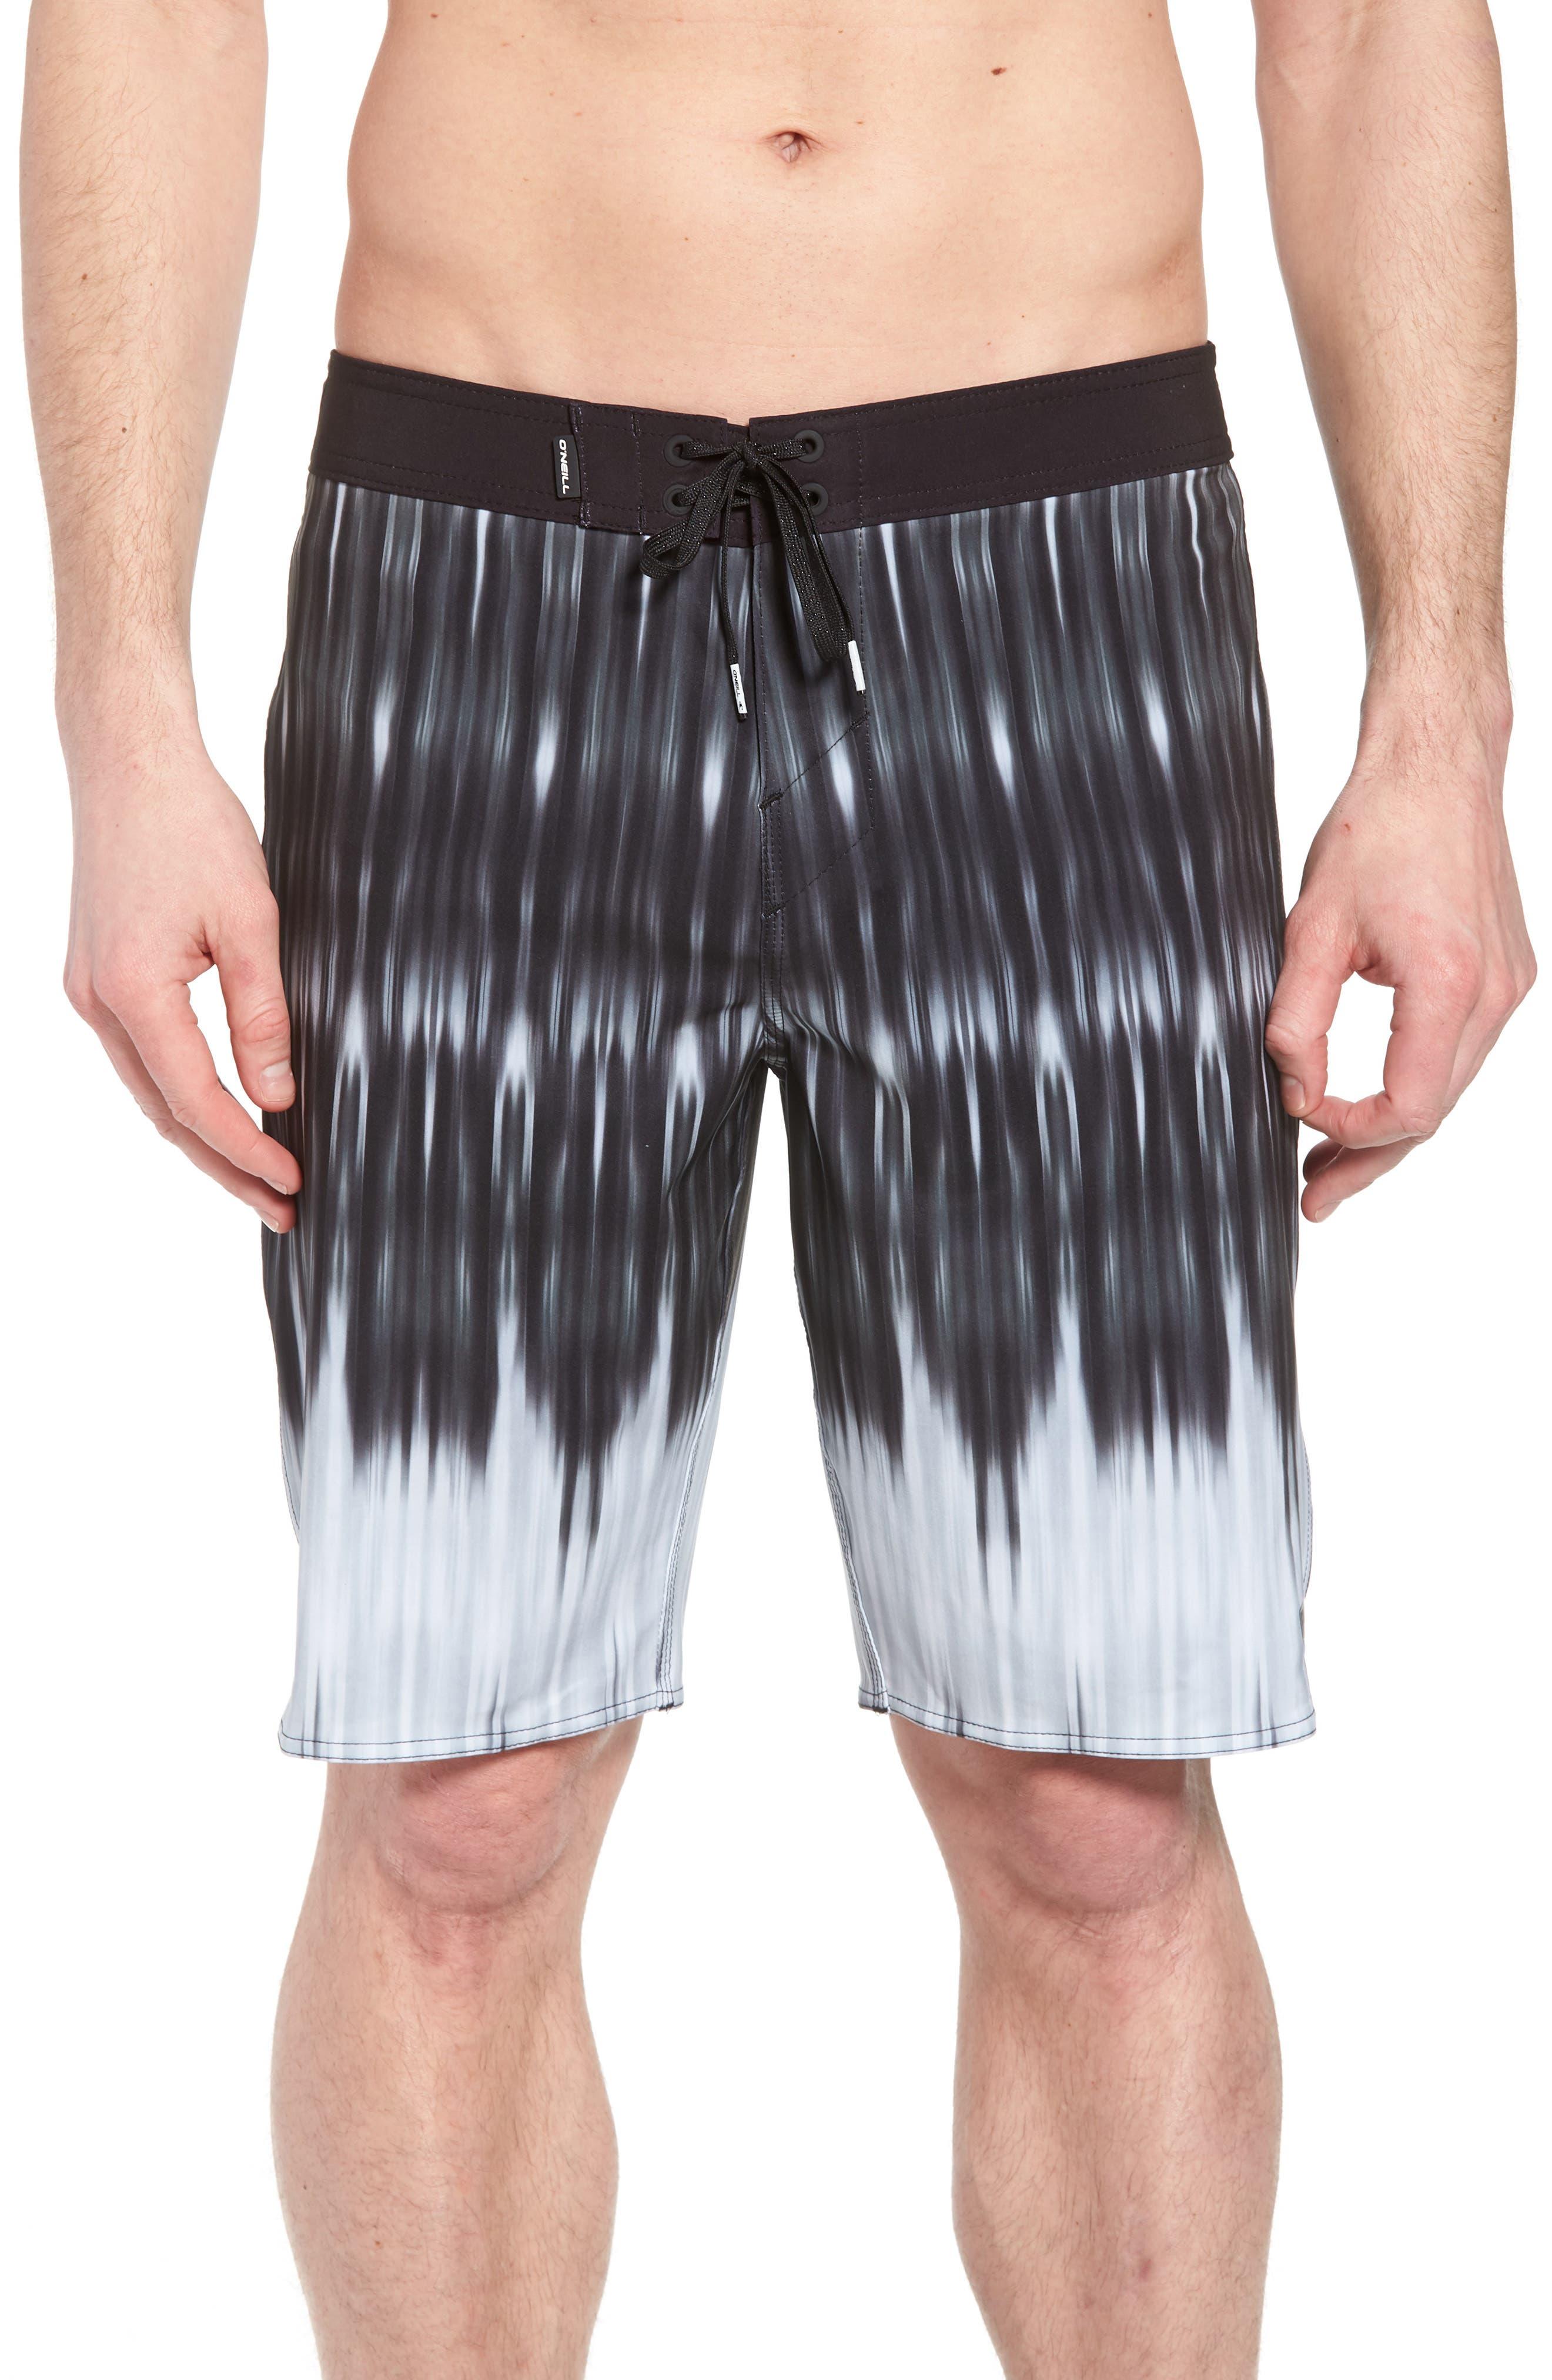 Superfreak Dimension Board Shorts,                         Main,                         color, Black